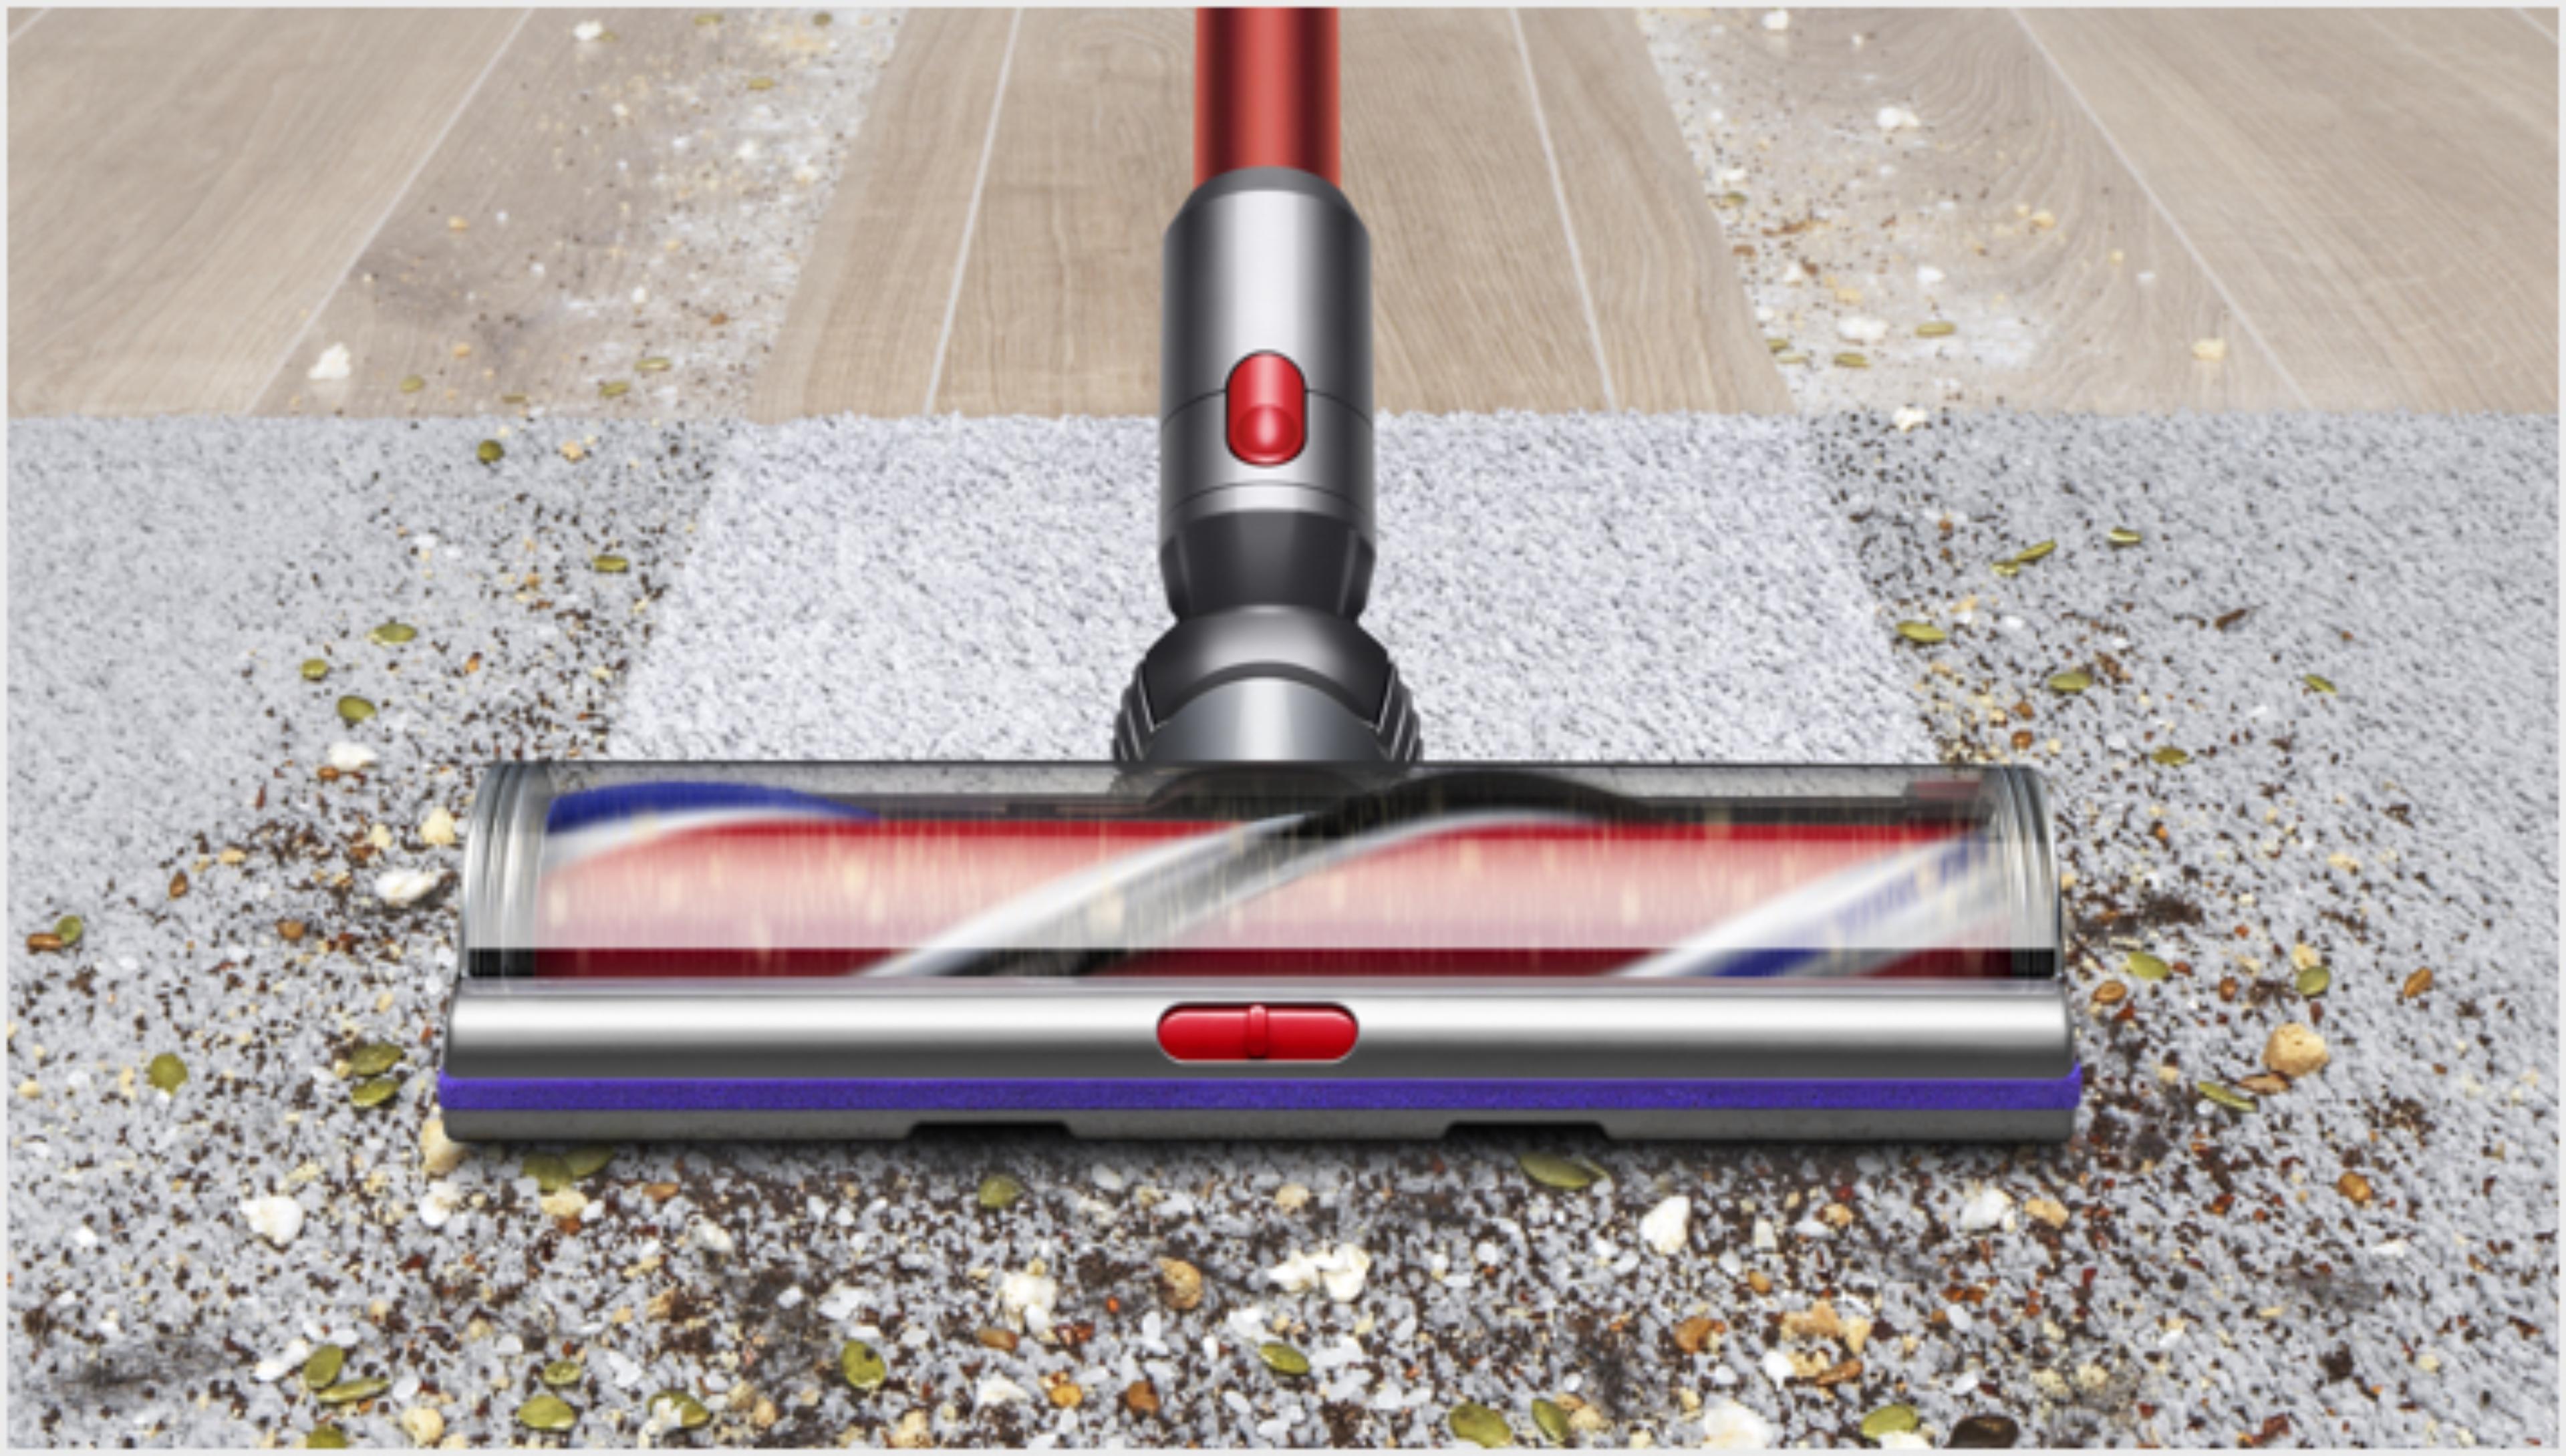 Cabezal High Torque XL pasando del piso duro a la alfombra